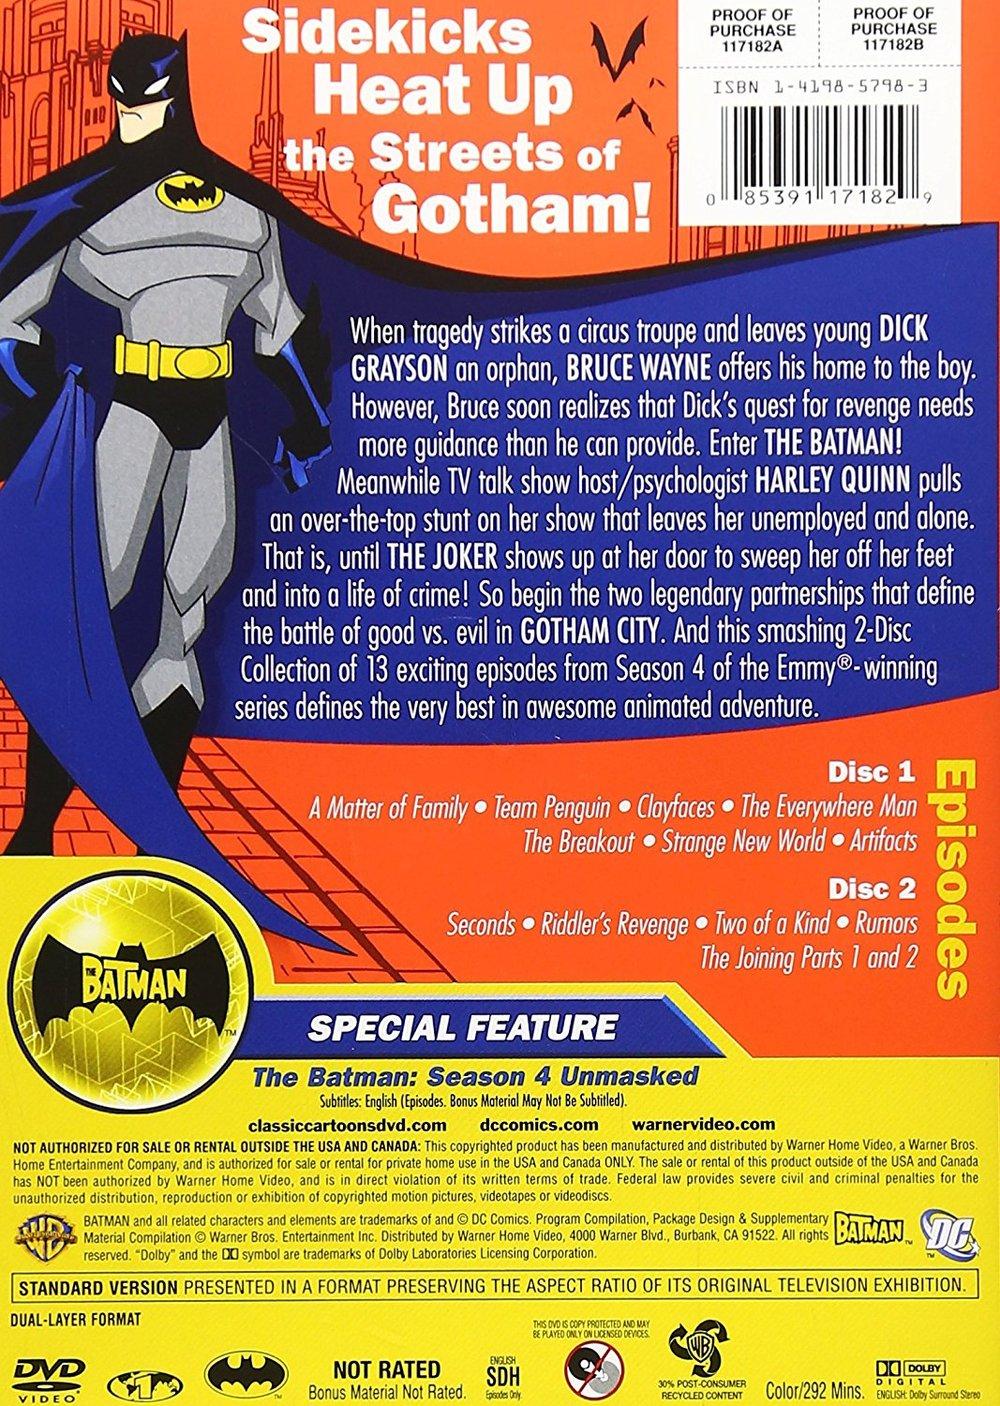 The Batman S4 back.jpg